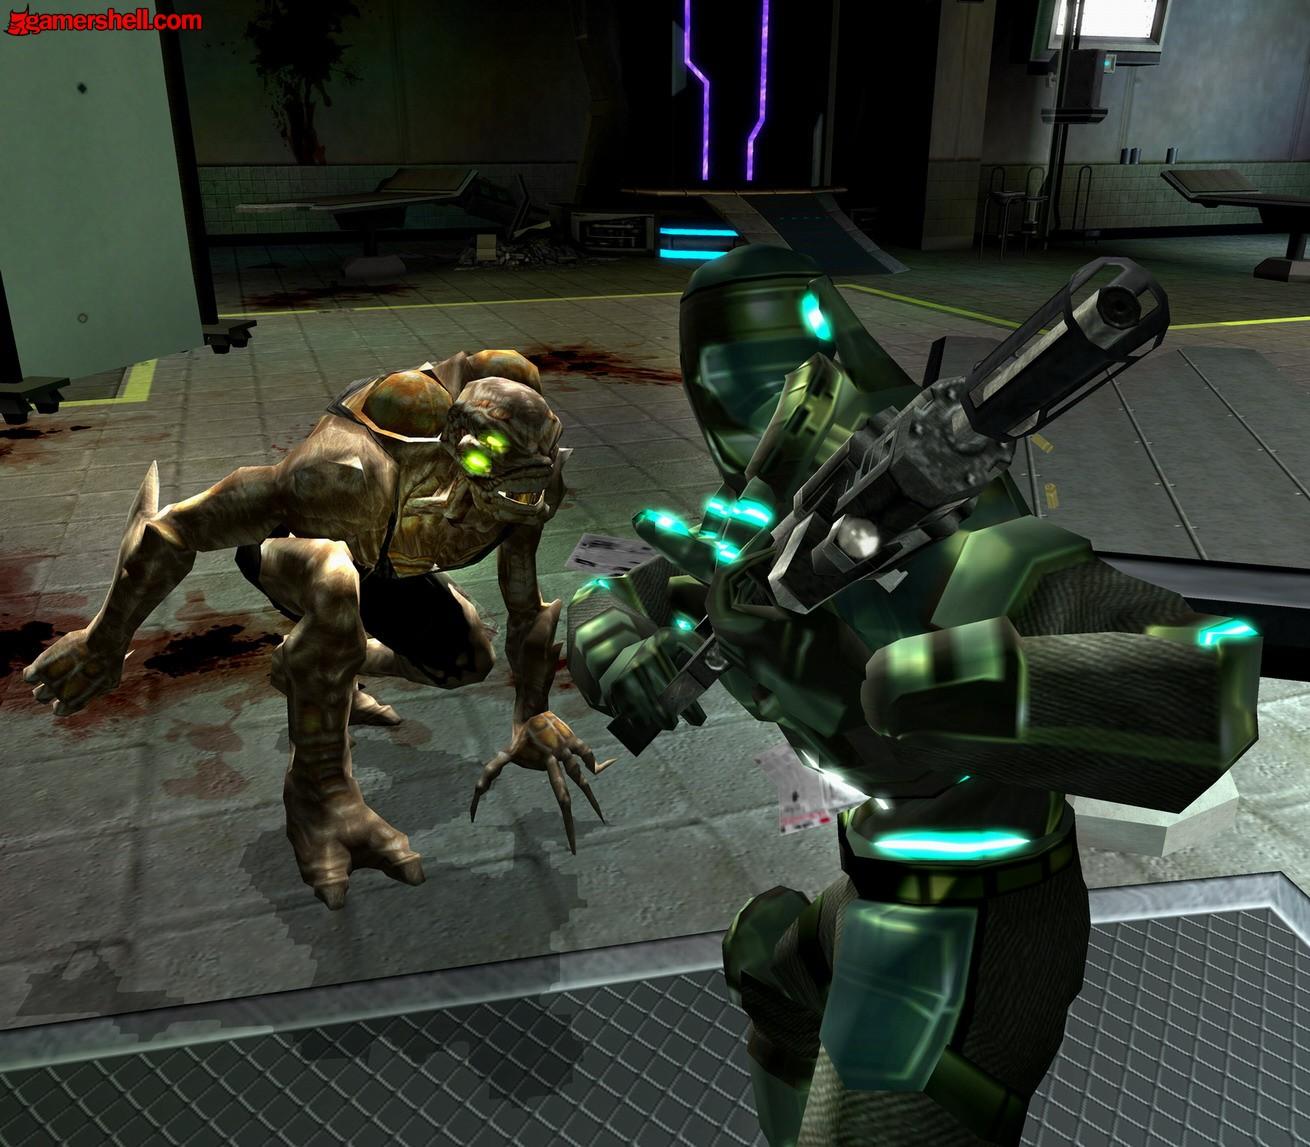 Amazon.com: Area 51 - PC: Video Games